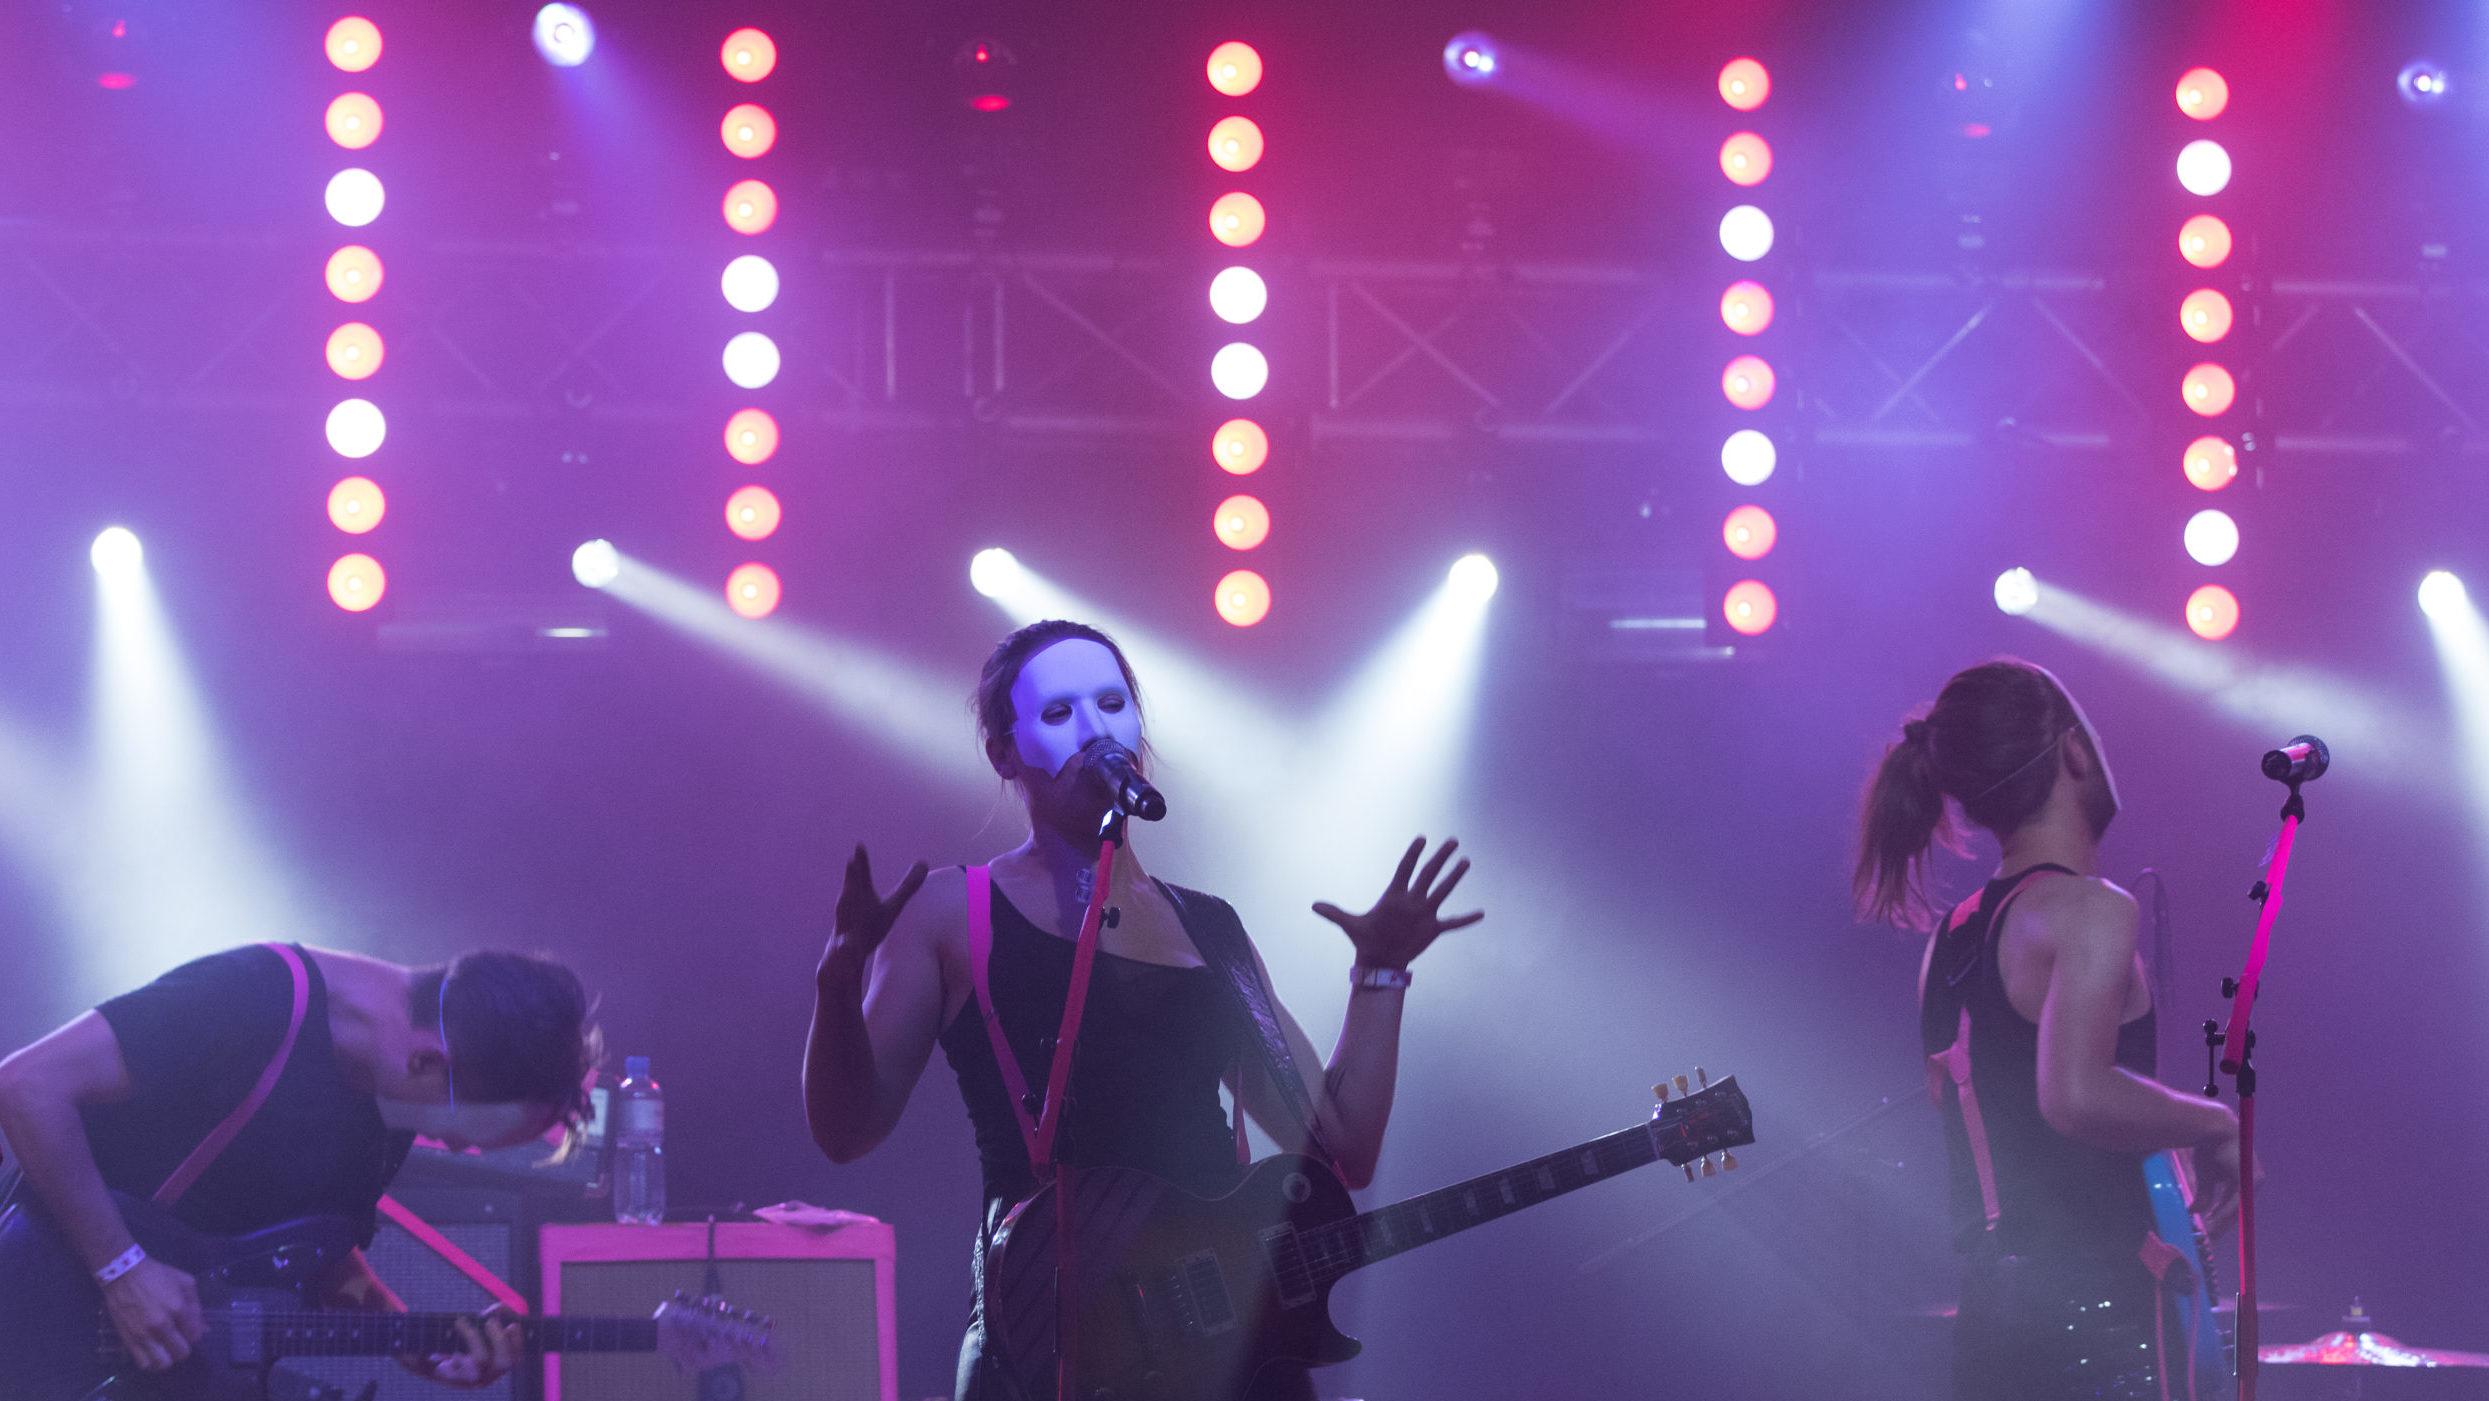 John Gailo am Vorstadt Sounds Festival 2017